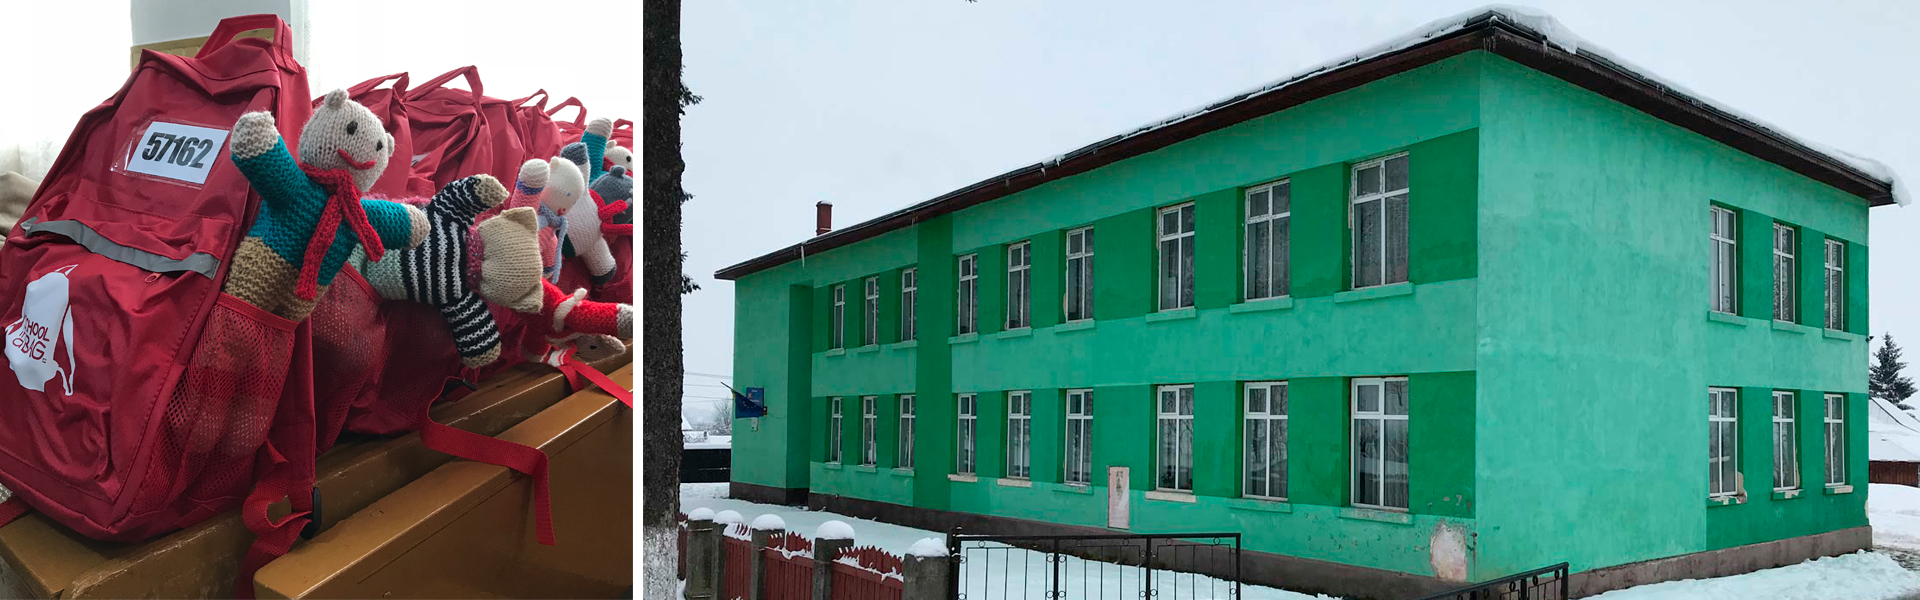 Romania School Gallery 1